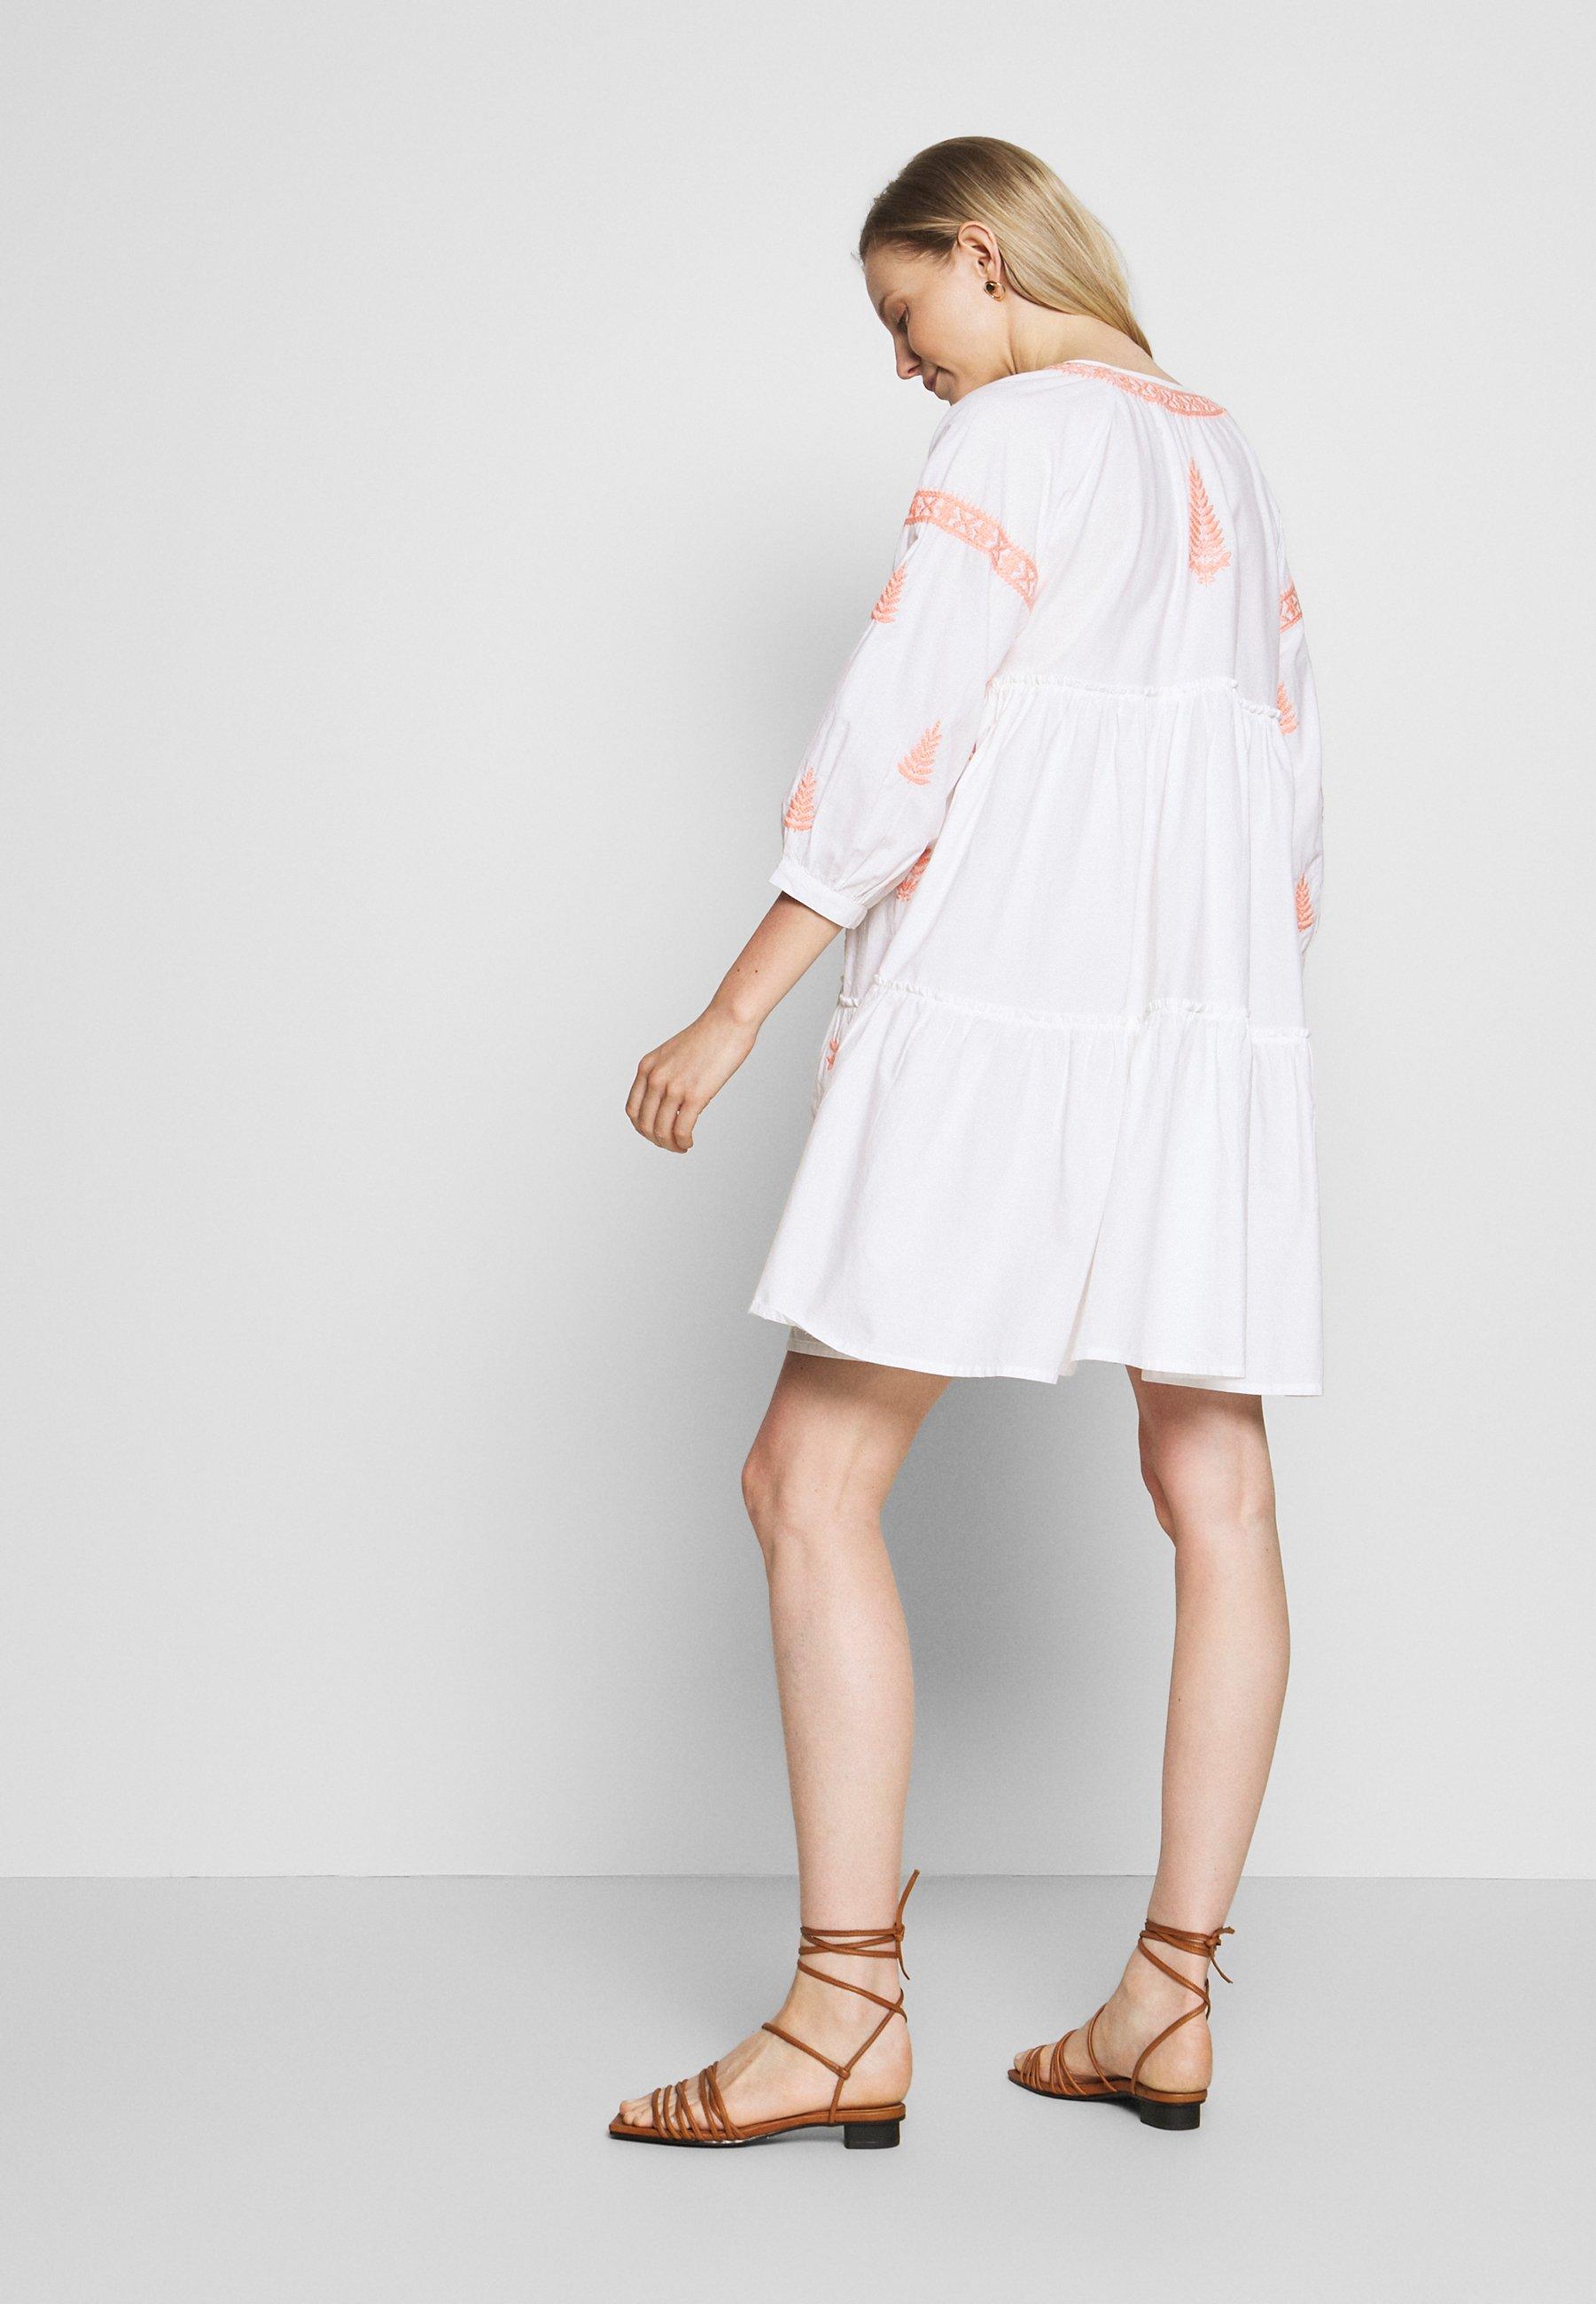 The Cheapest Women's Clothing By Malina MIMI DRESS Day dress peach blush eruNsmKFK